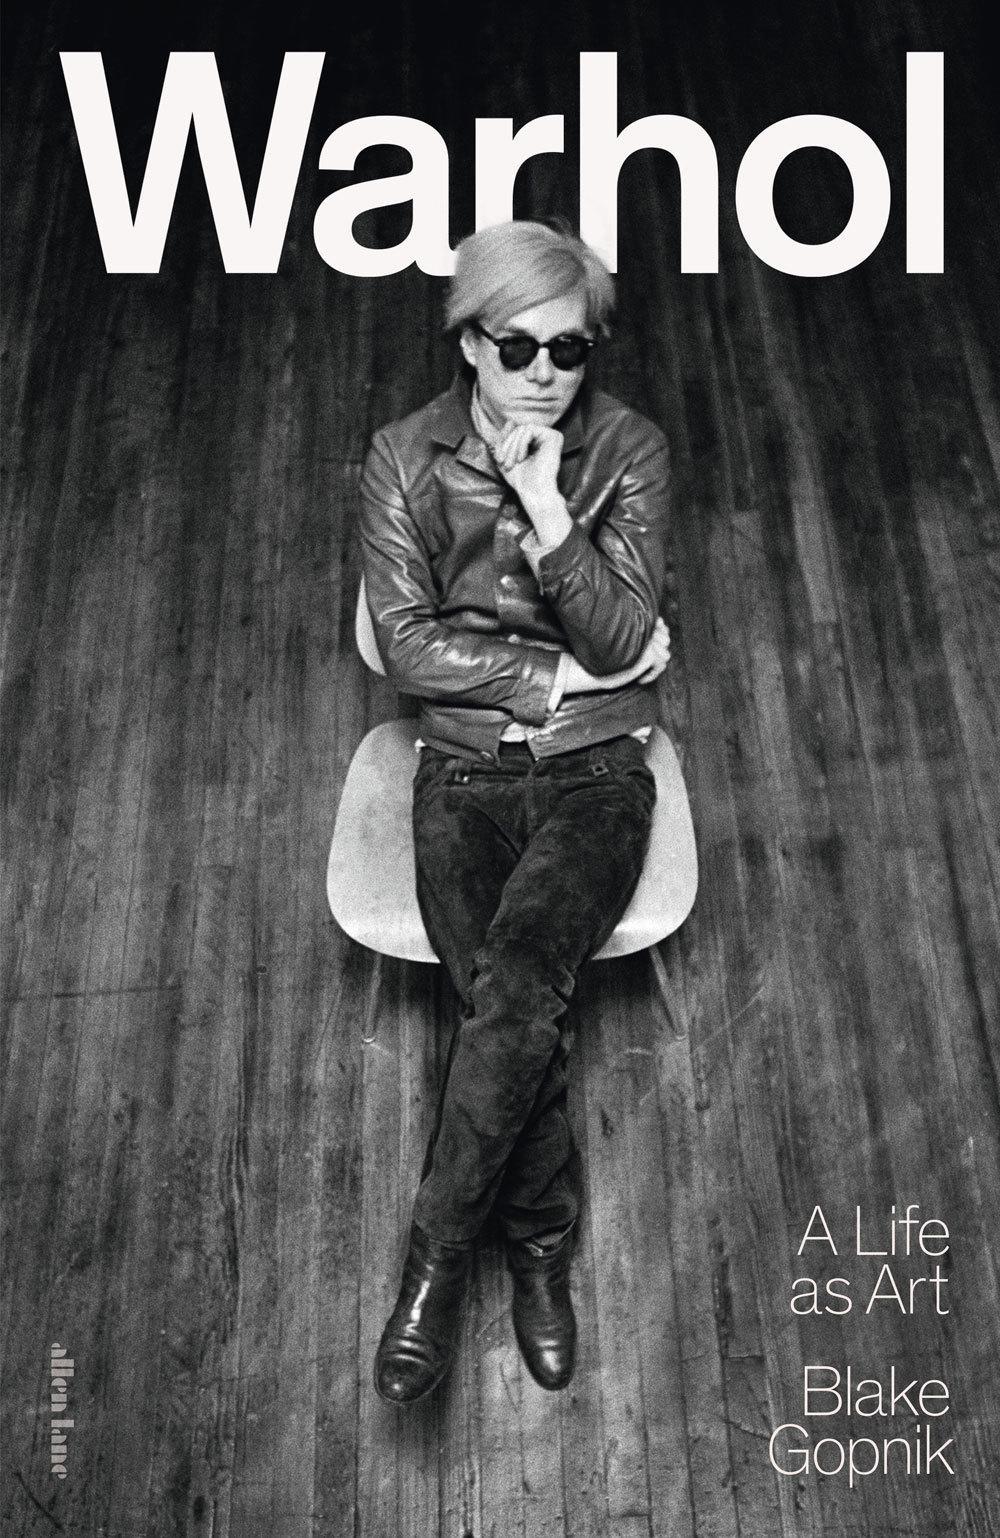 Warhol: A LifeasArt